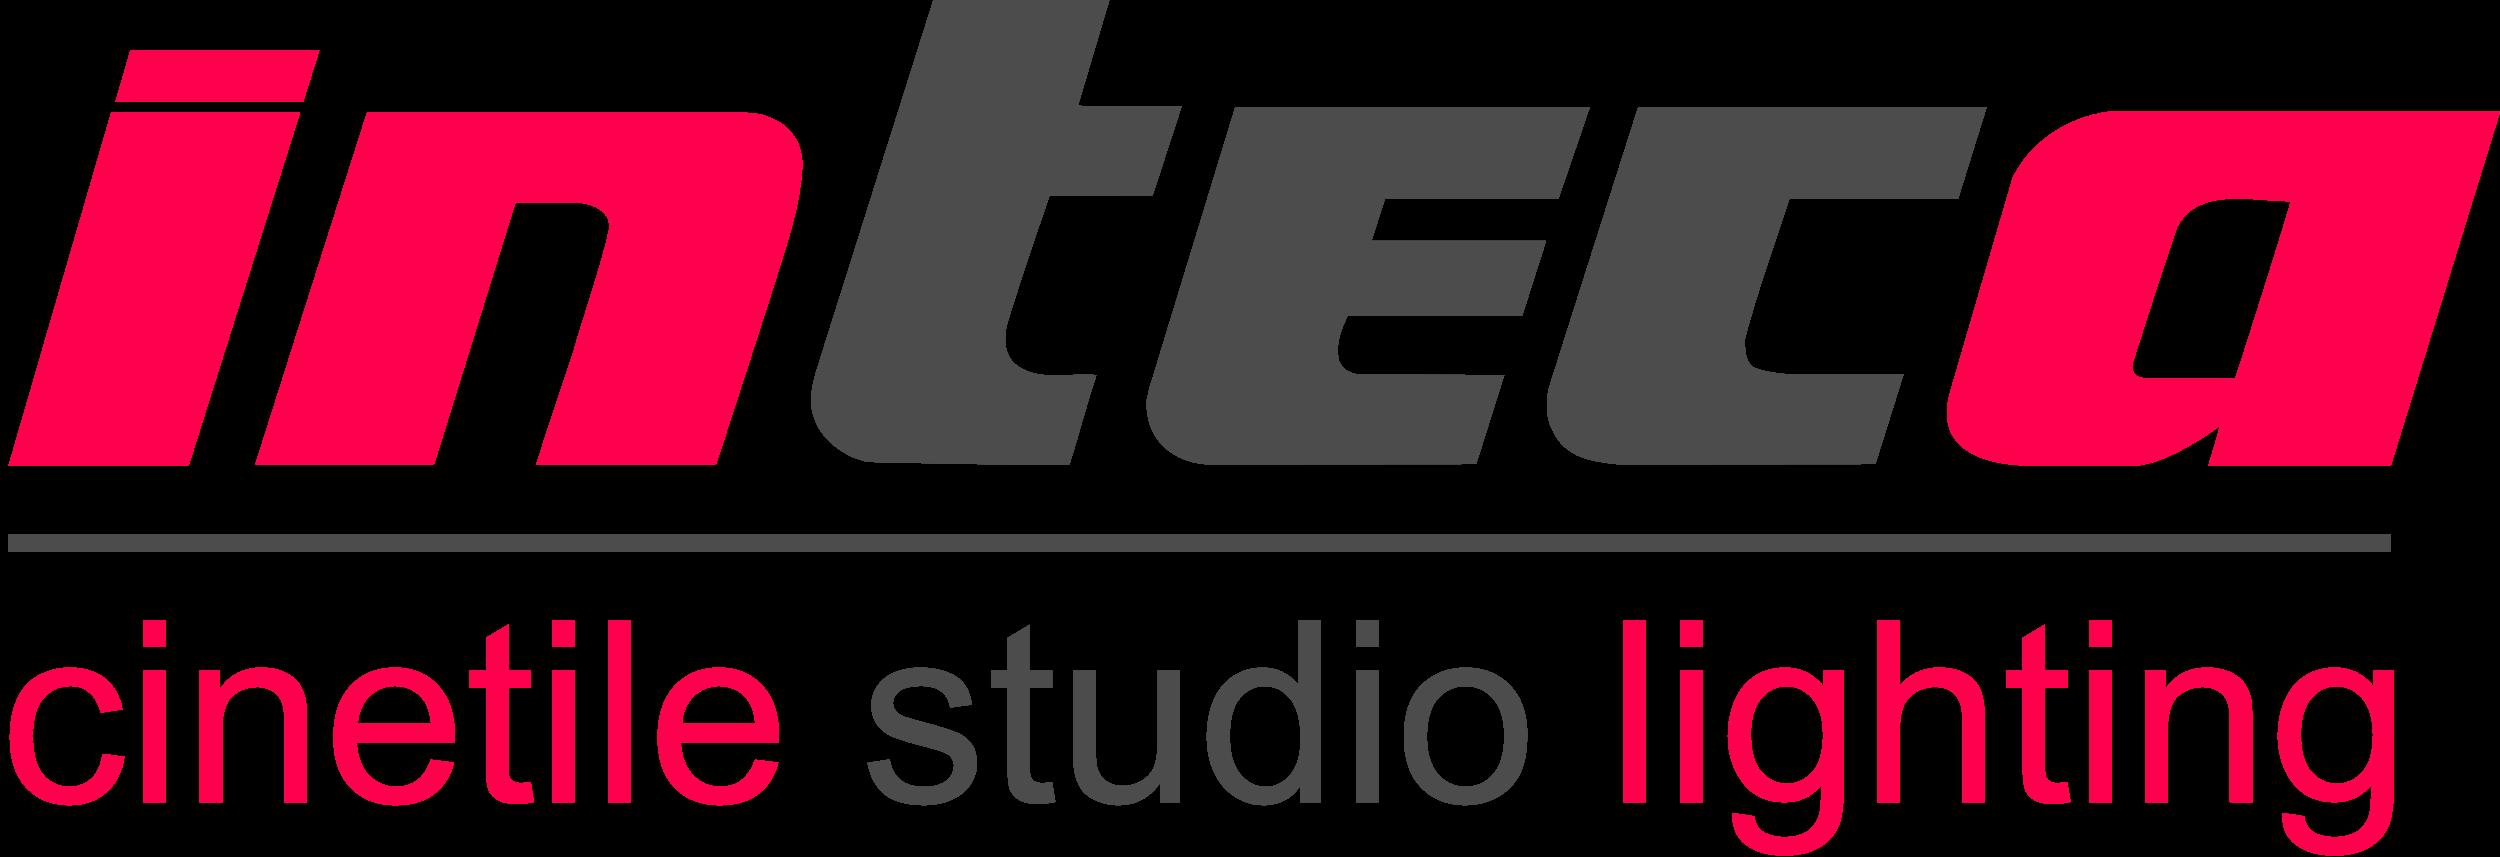 LED-Studiobeleuchtung